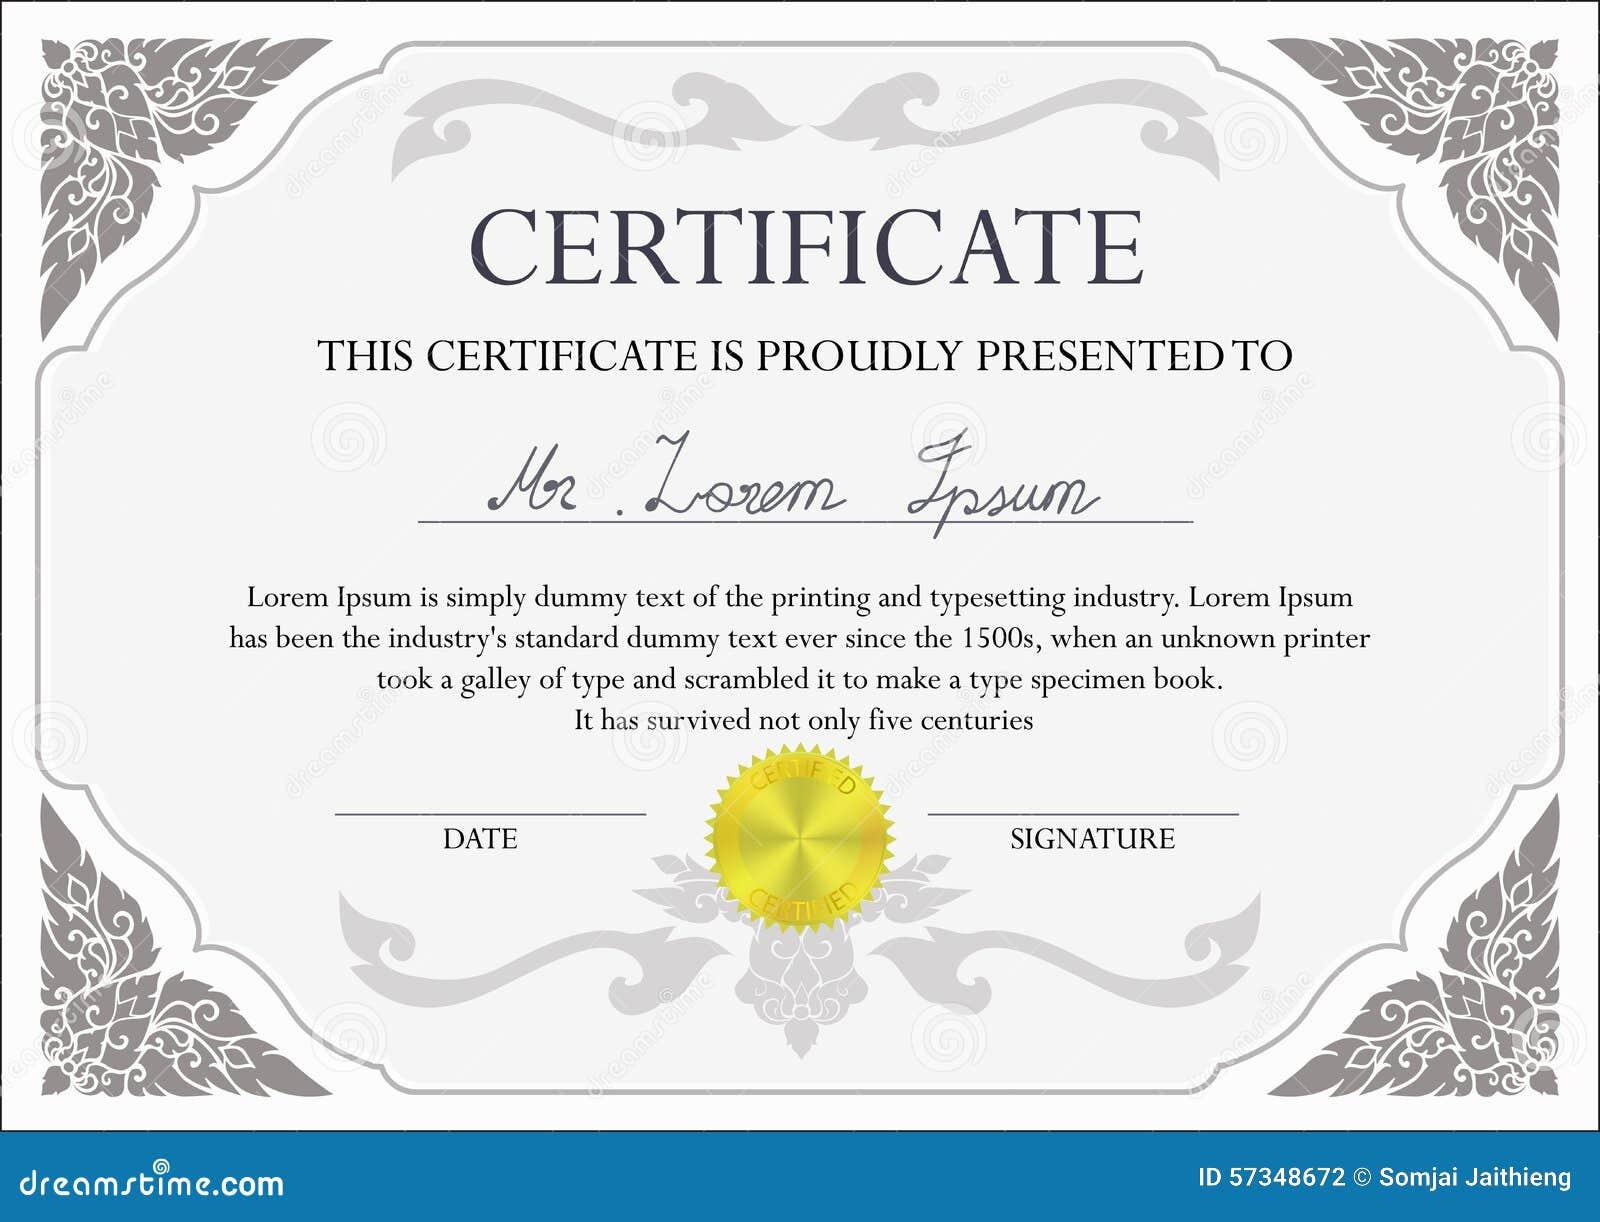 Certificate Design Template Stock Vector - Image: 57348672